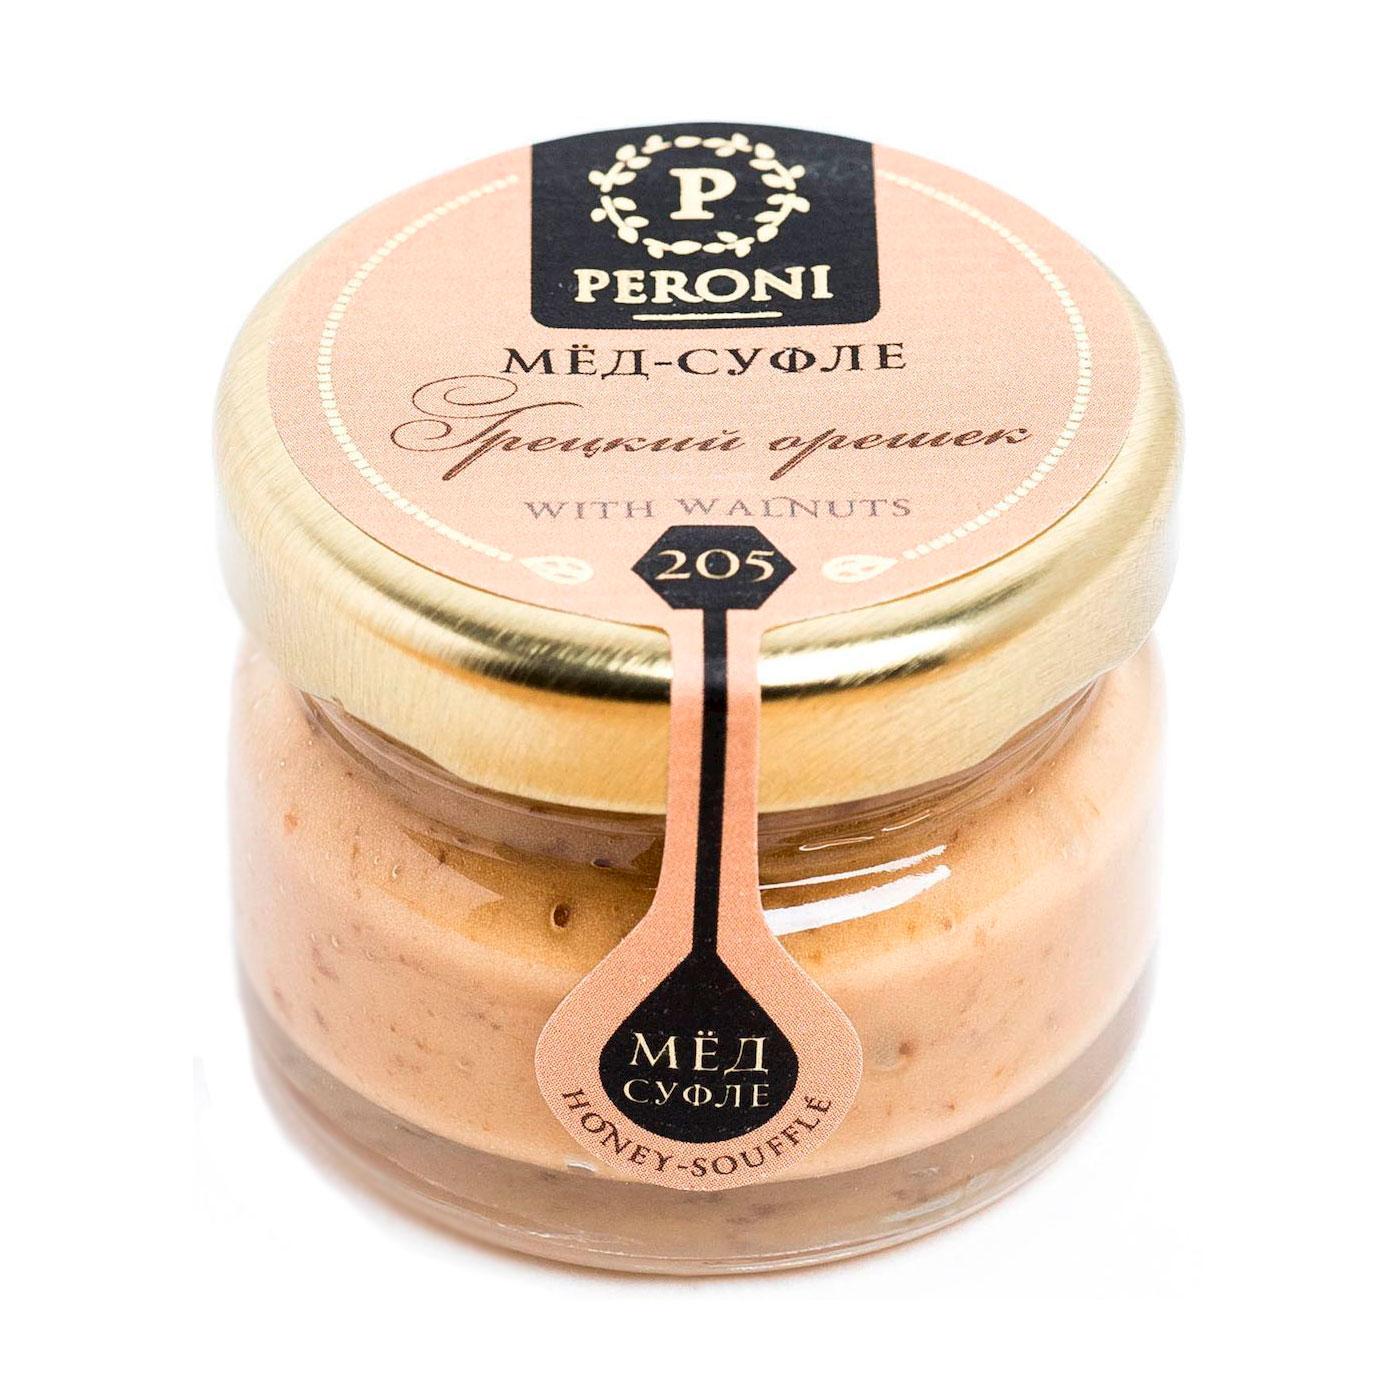 Мёд-суфле Peroni Honey 30 мл Грецкий орешек (маленькая)<br>